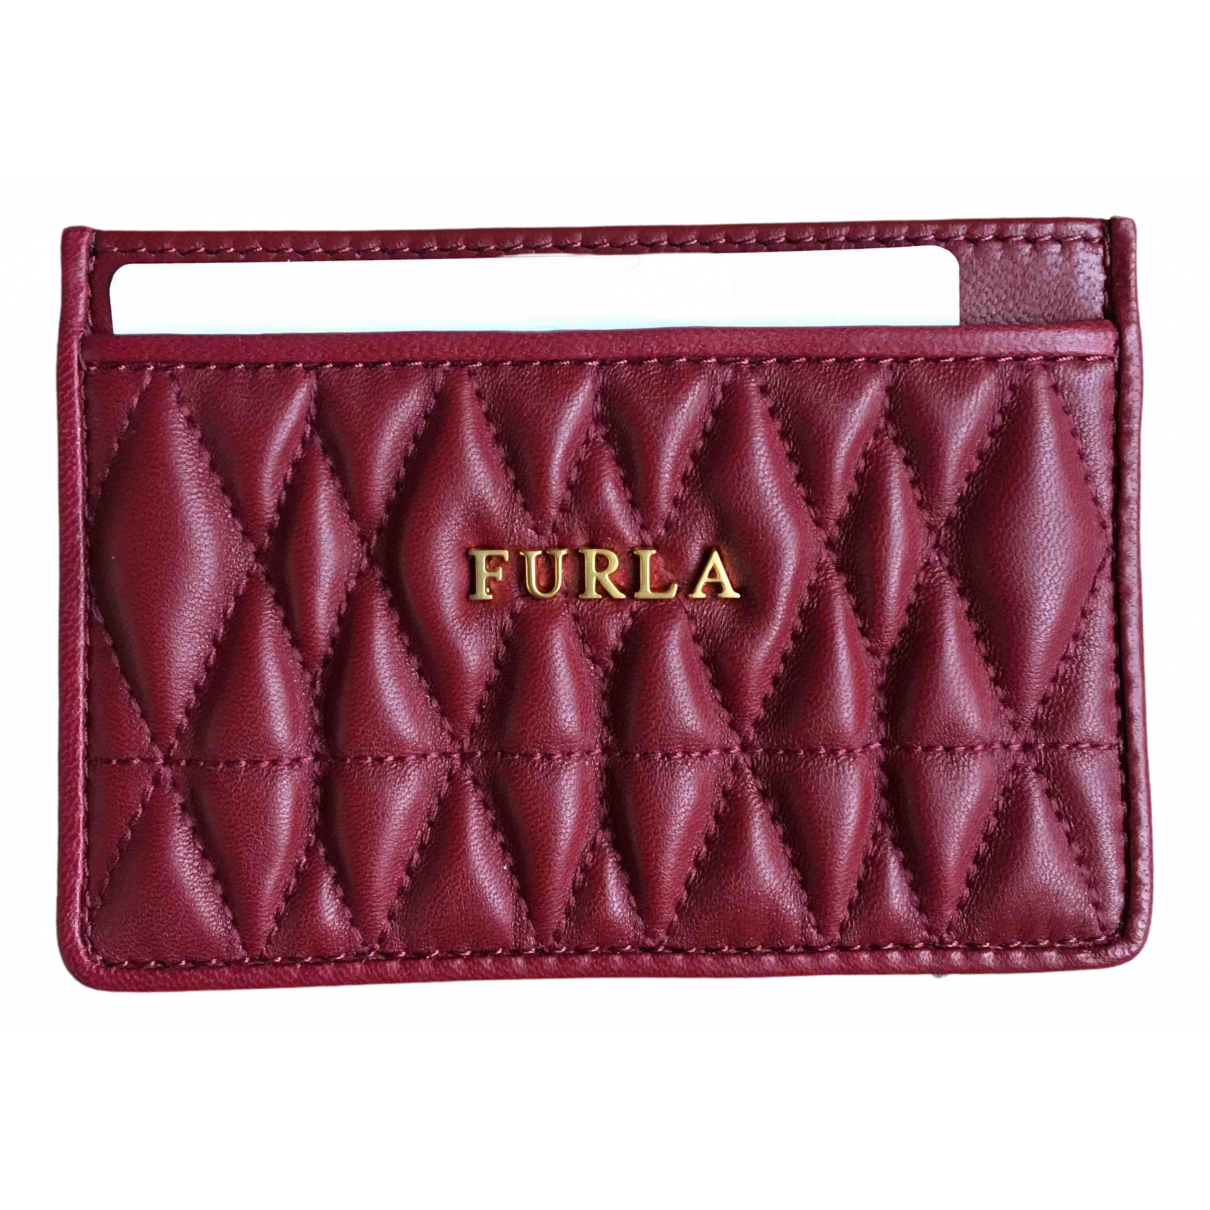 Furla N Burgundy Leather Purses, wallet & cases for Women N